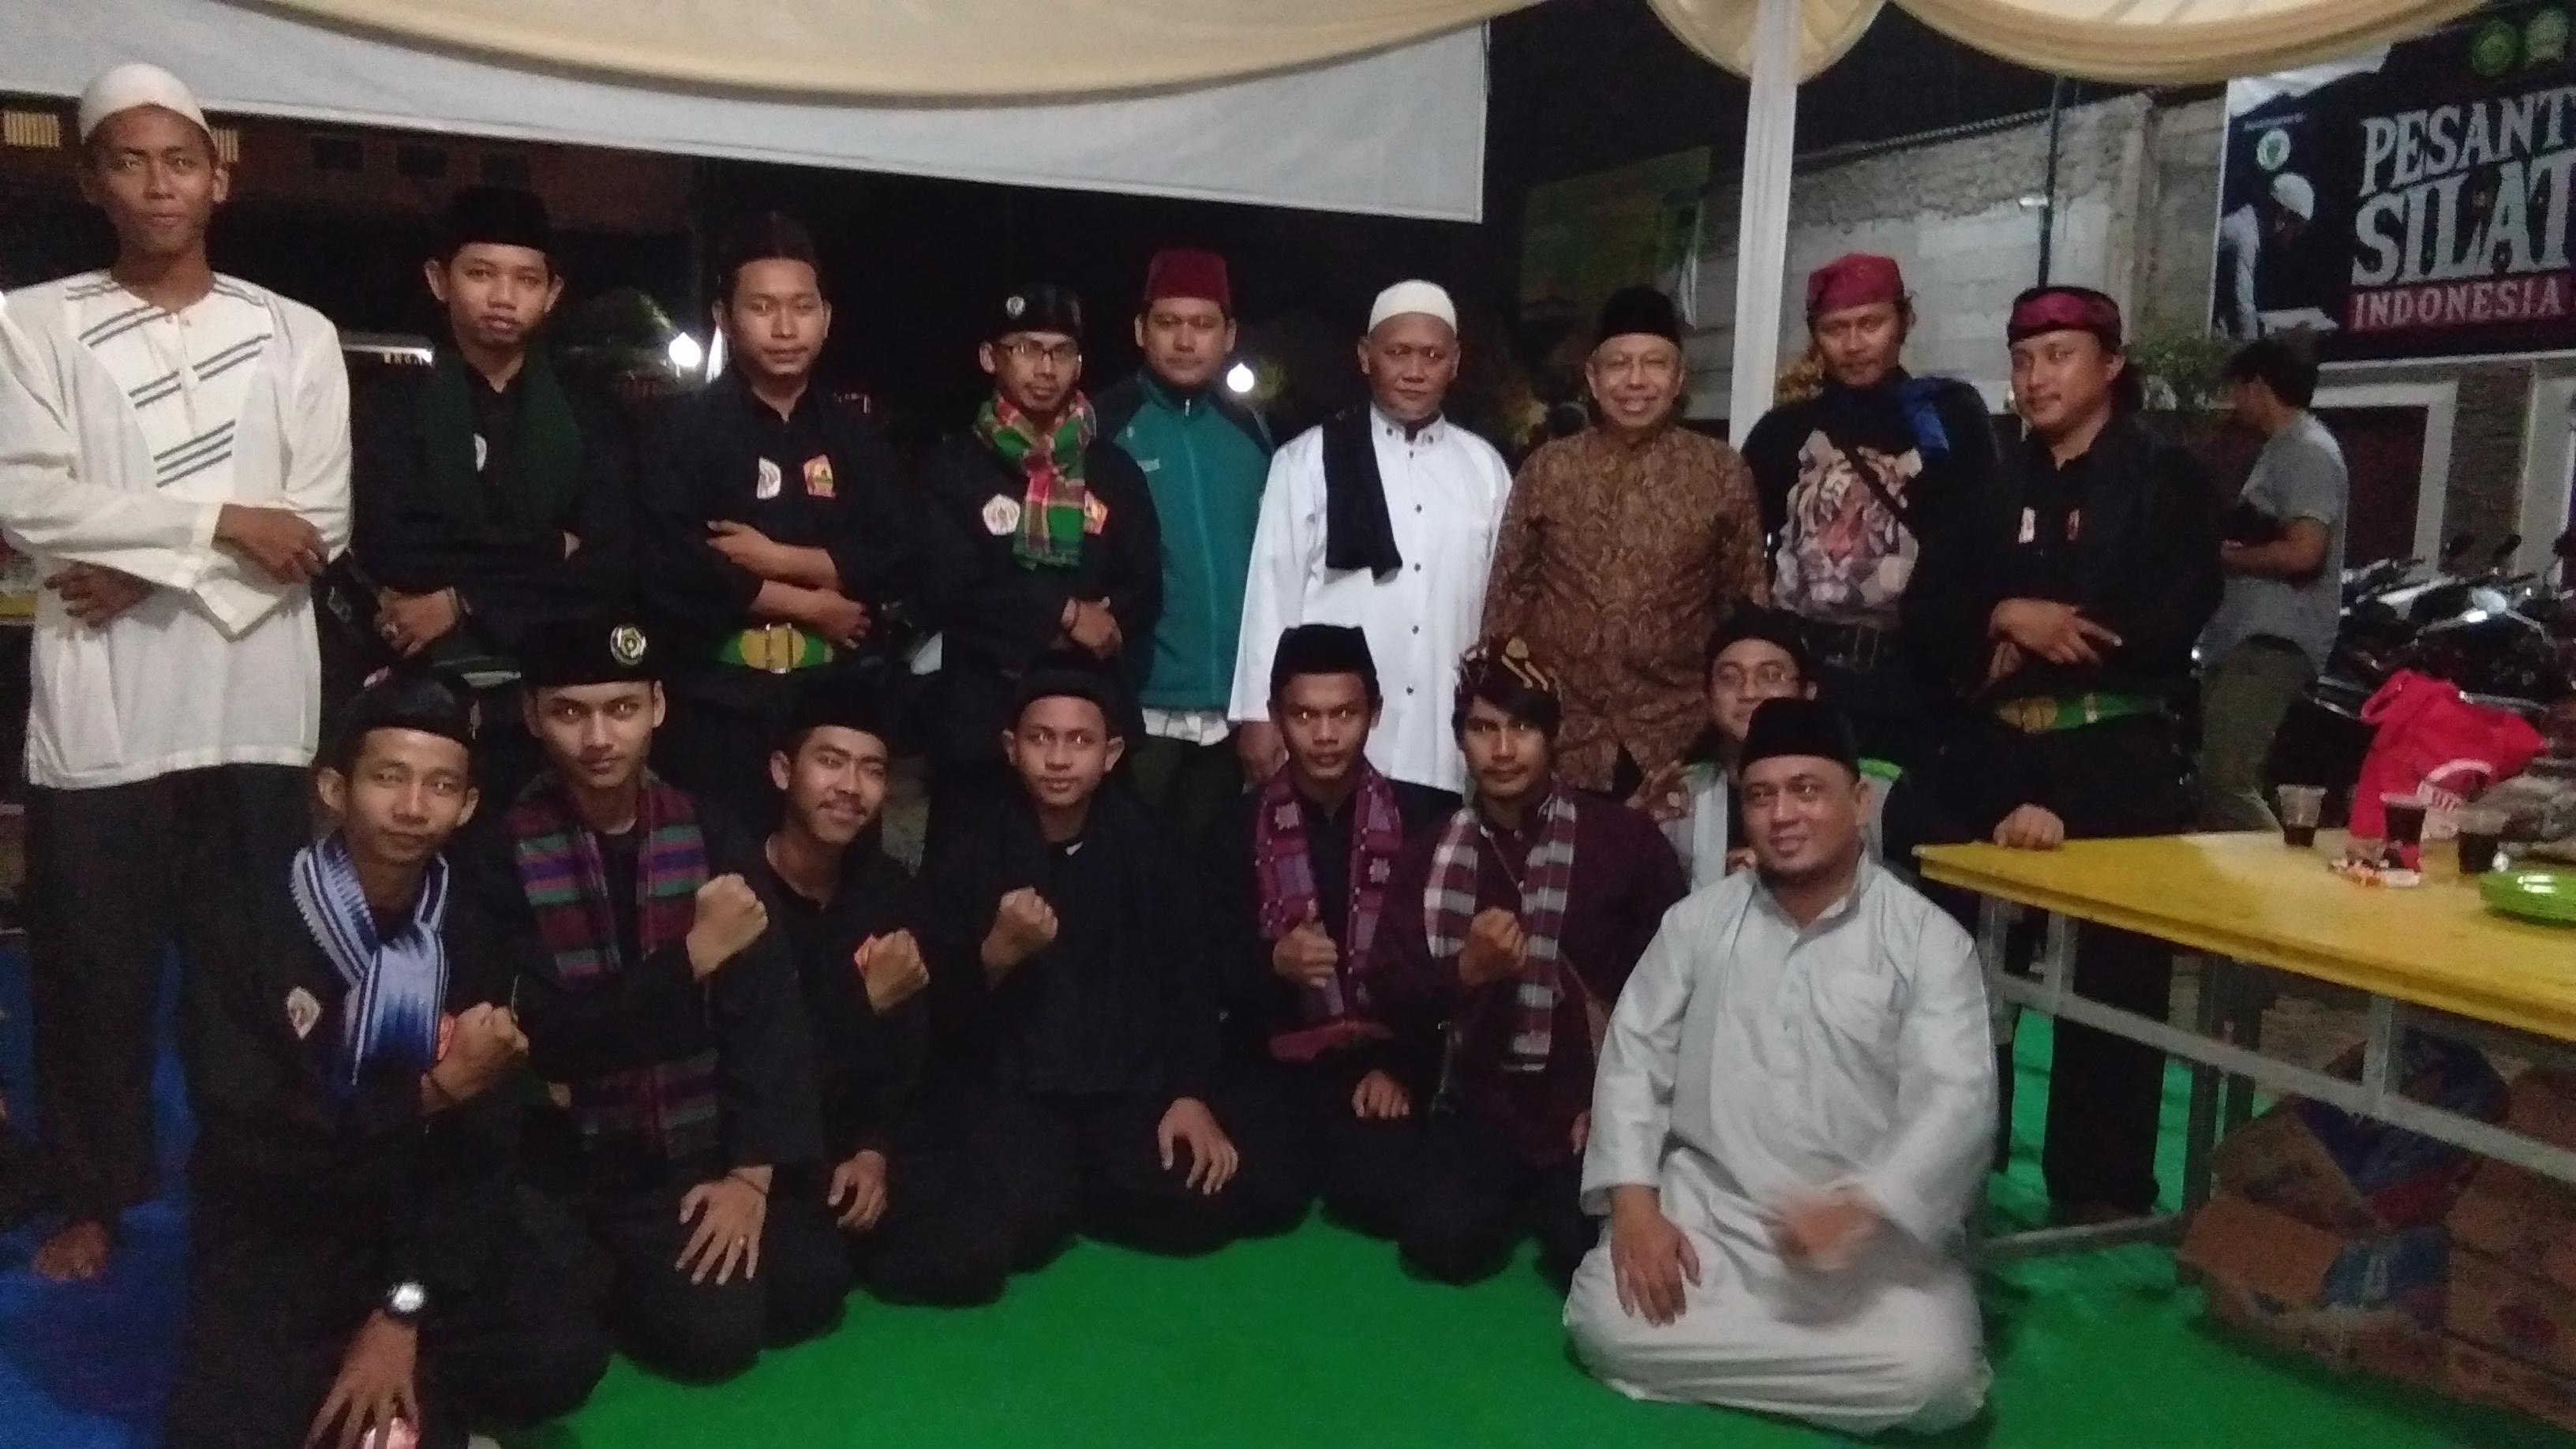 Ratusan Jawara Bekasi Ikuti Pesantren SILAT Ramadhan